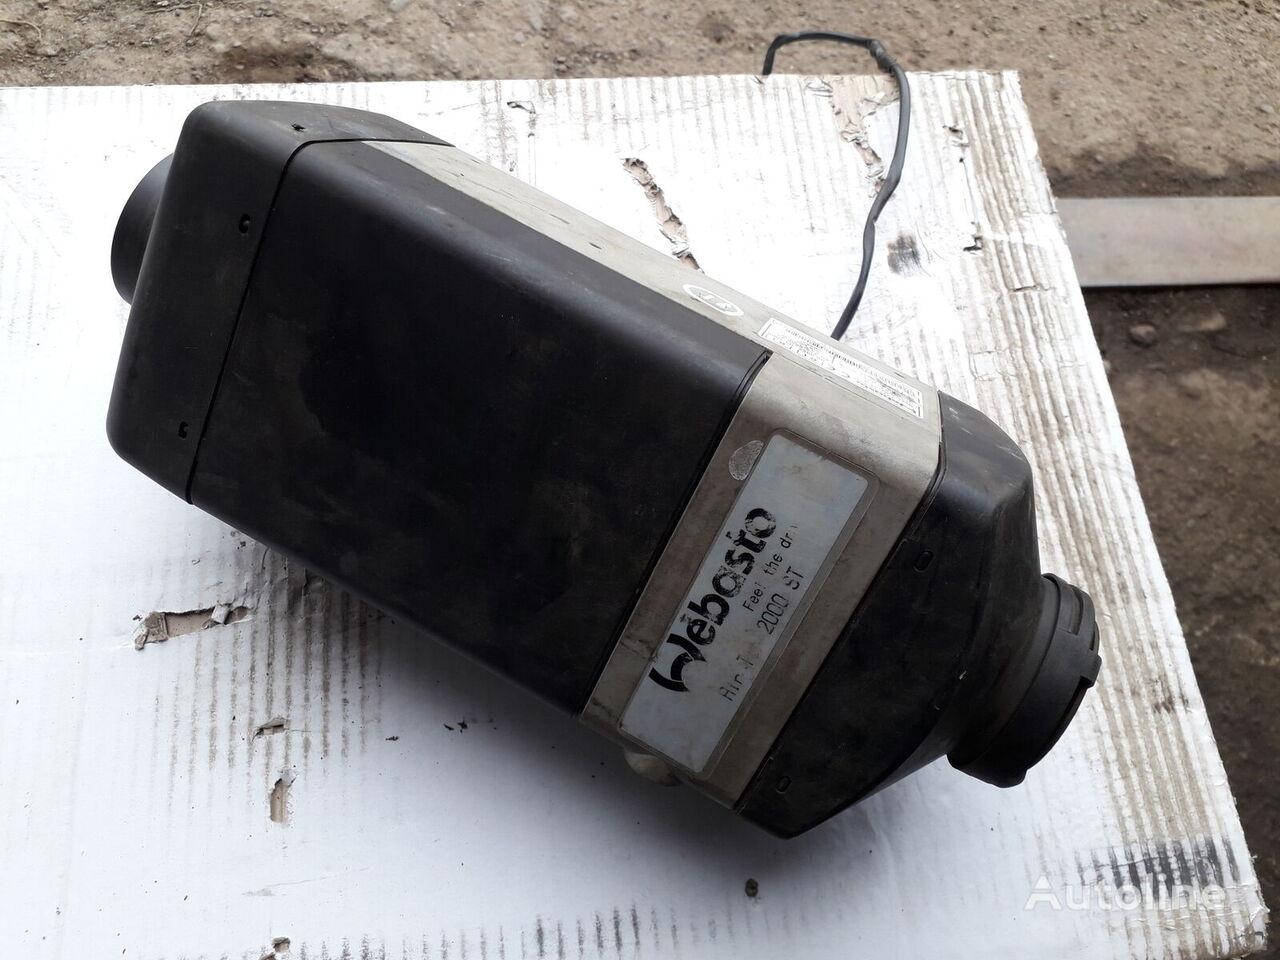 Webasto 2000 ST 24V Standheizung für MAN TGA Sattelzugmaschine